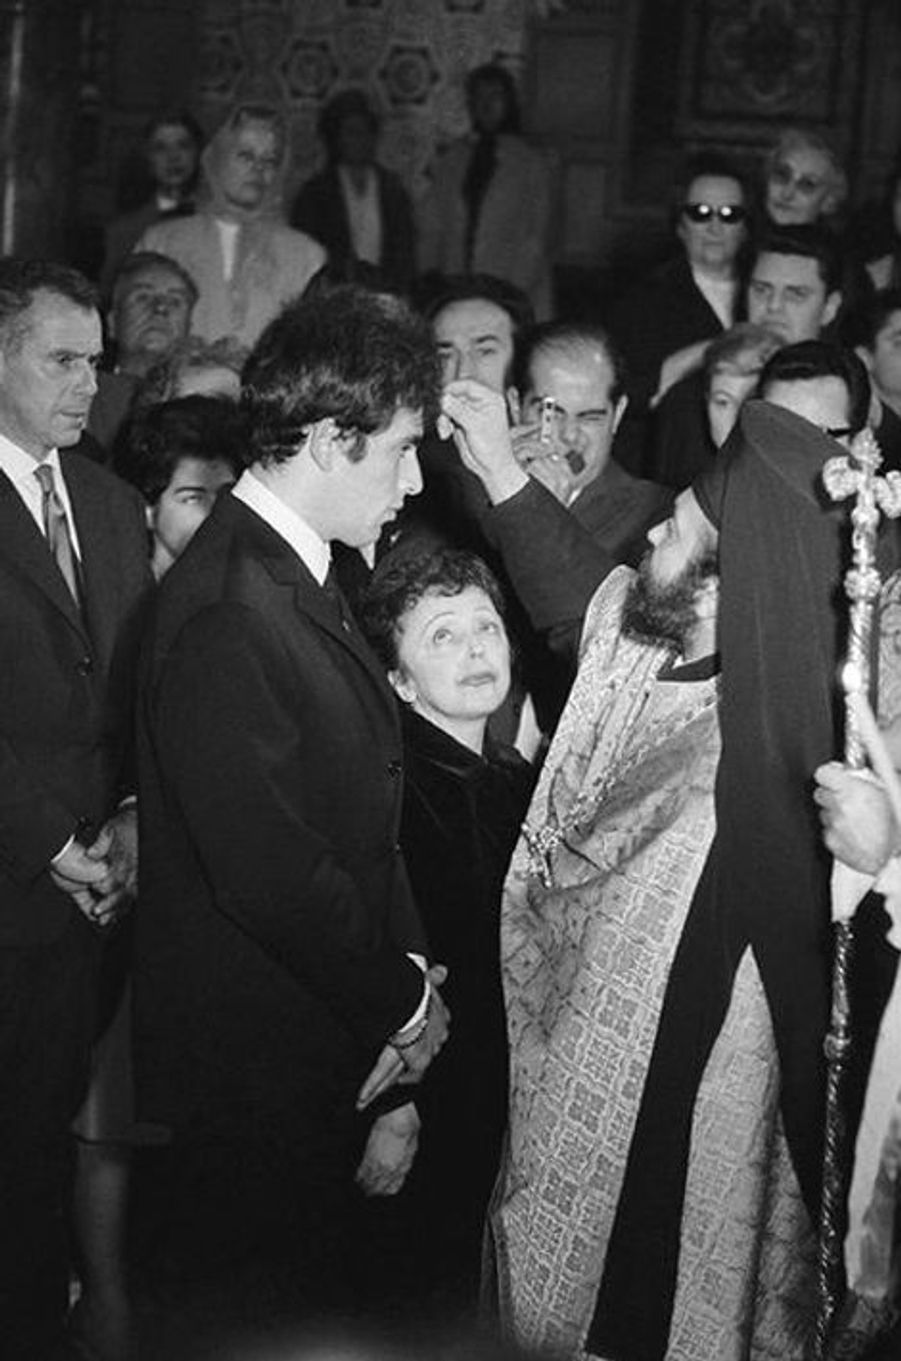 9 octobre 1962 : mariage d'Edith Piaf et Théo Sarapo